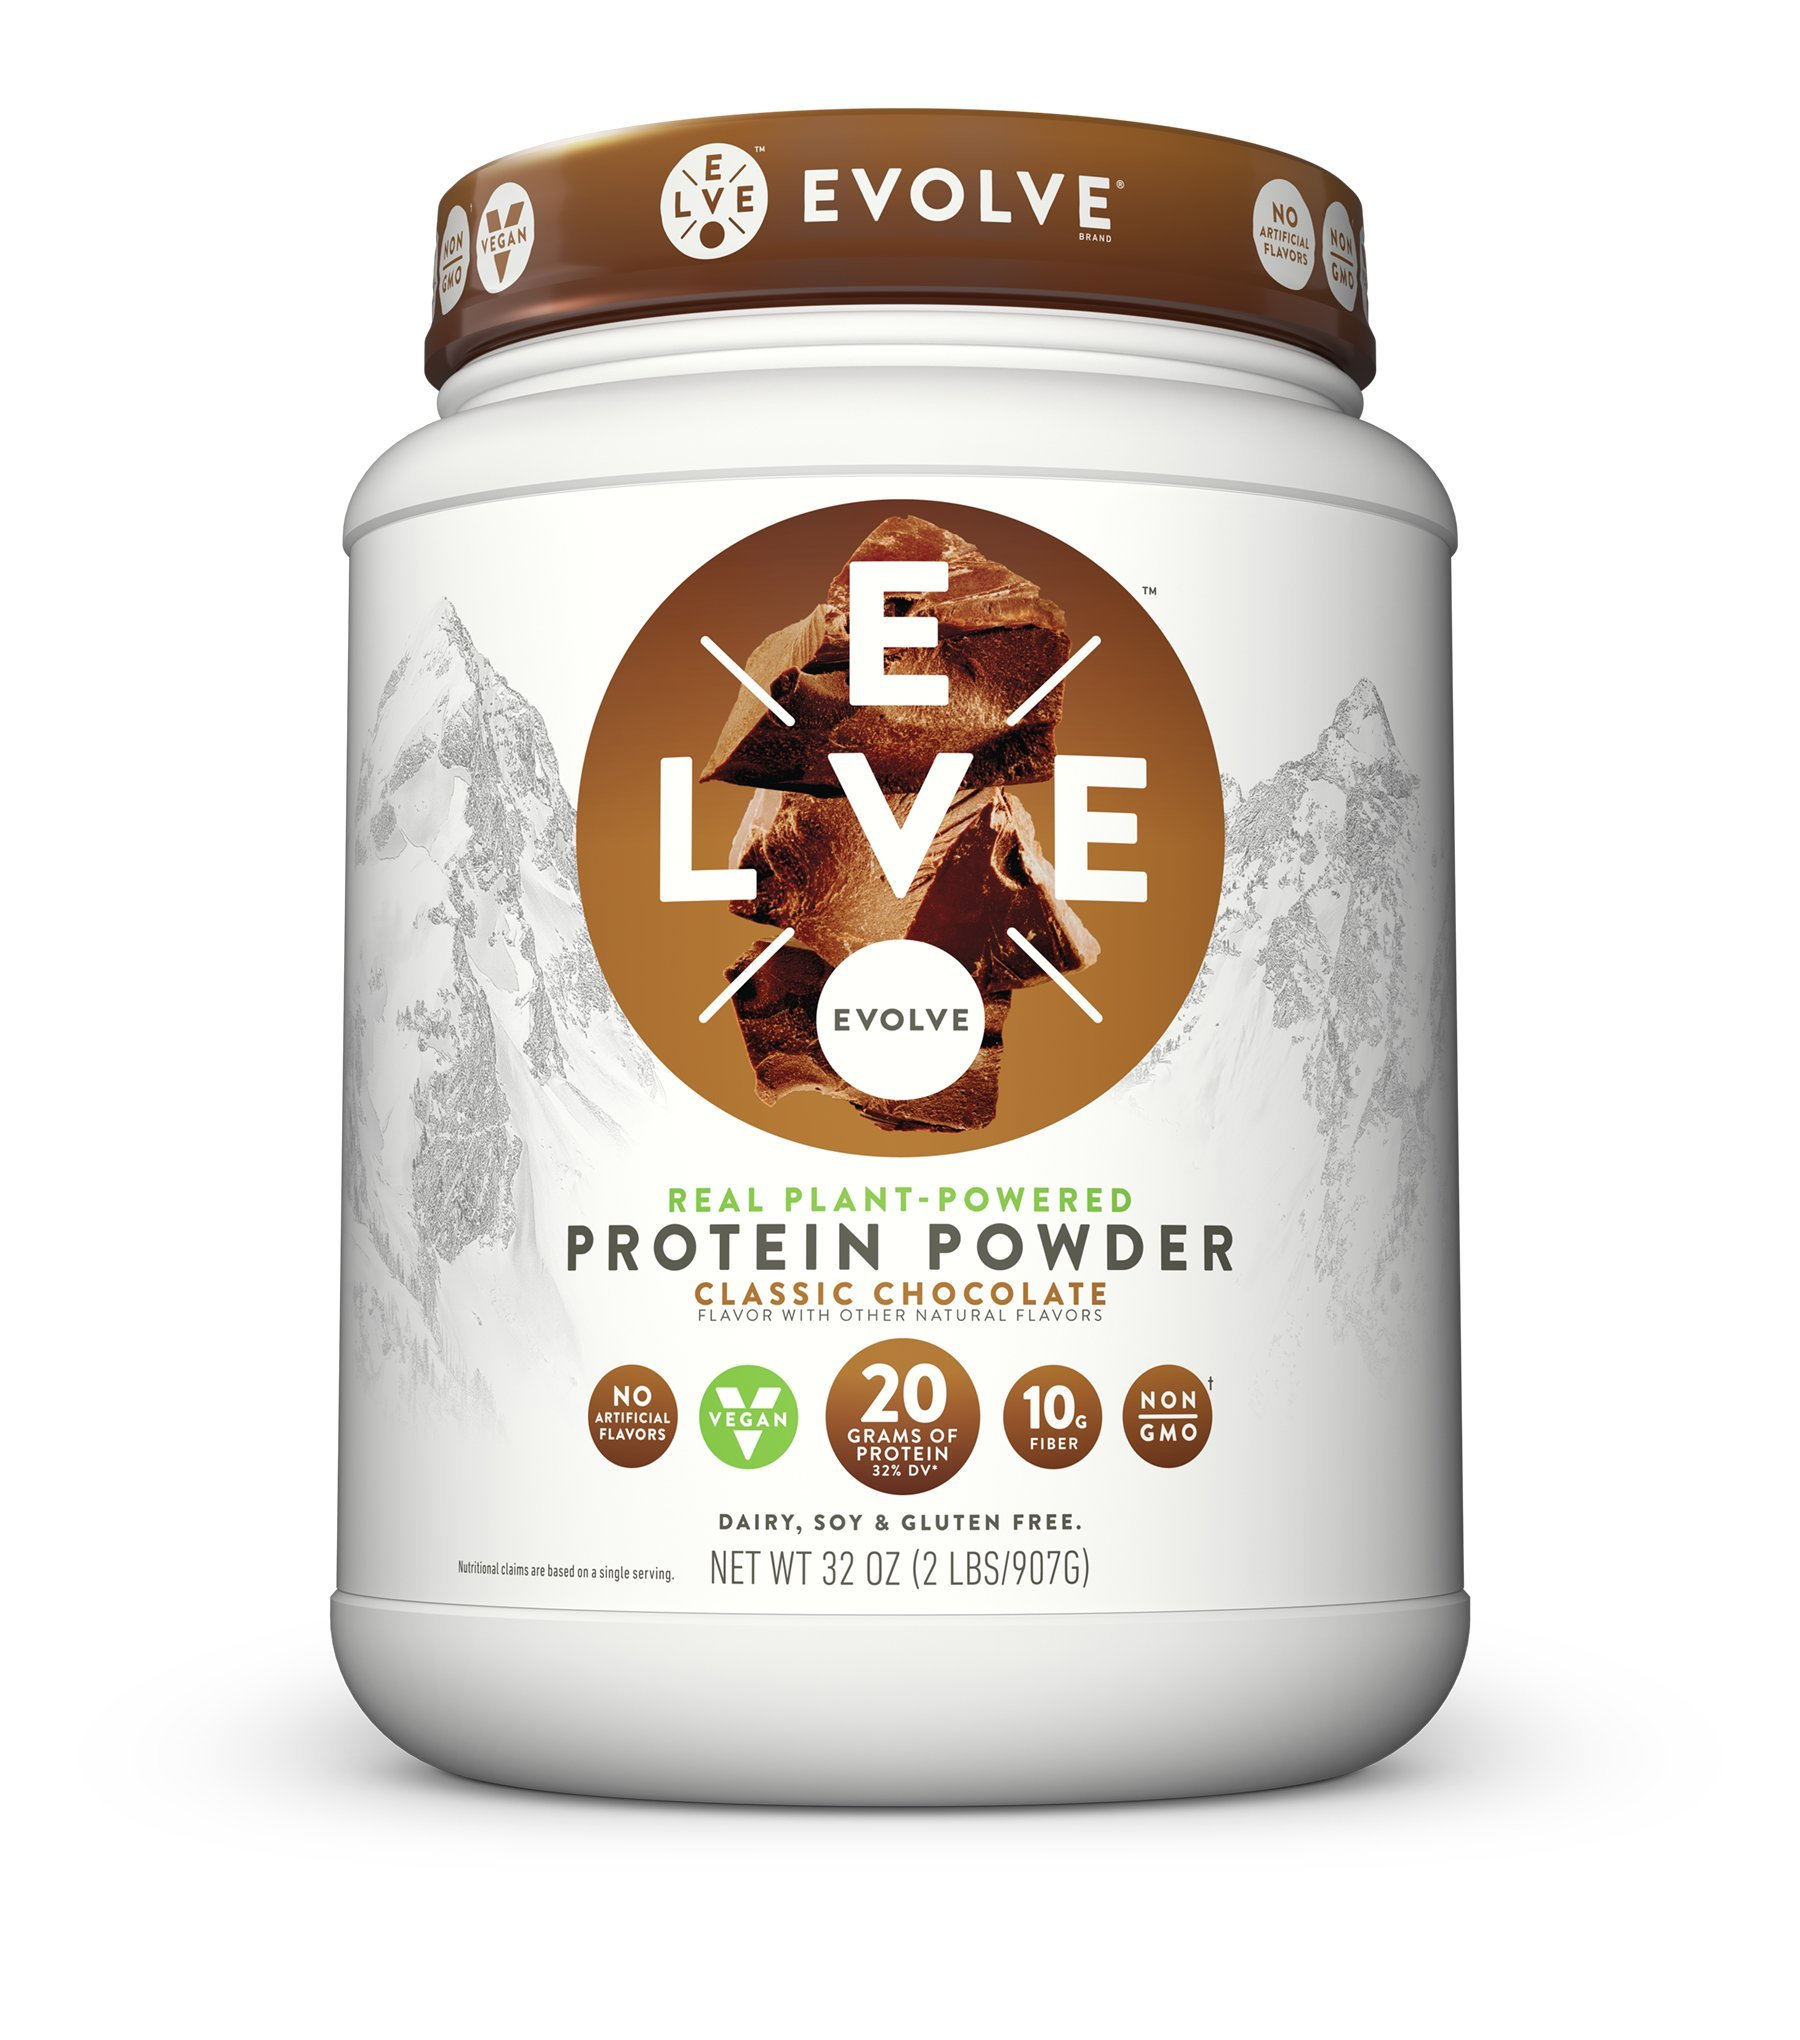 Evolve Protein Powder, Classic Chocolate, 20g Protein, 2 Pound by CytoSport